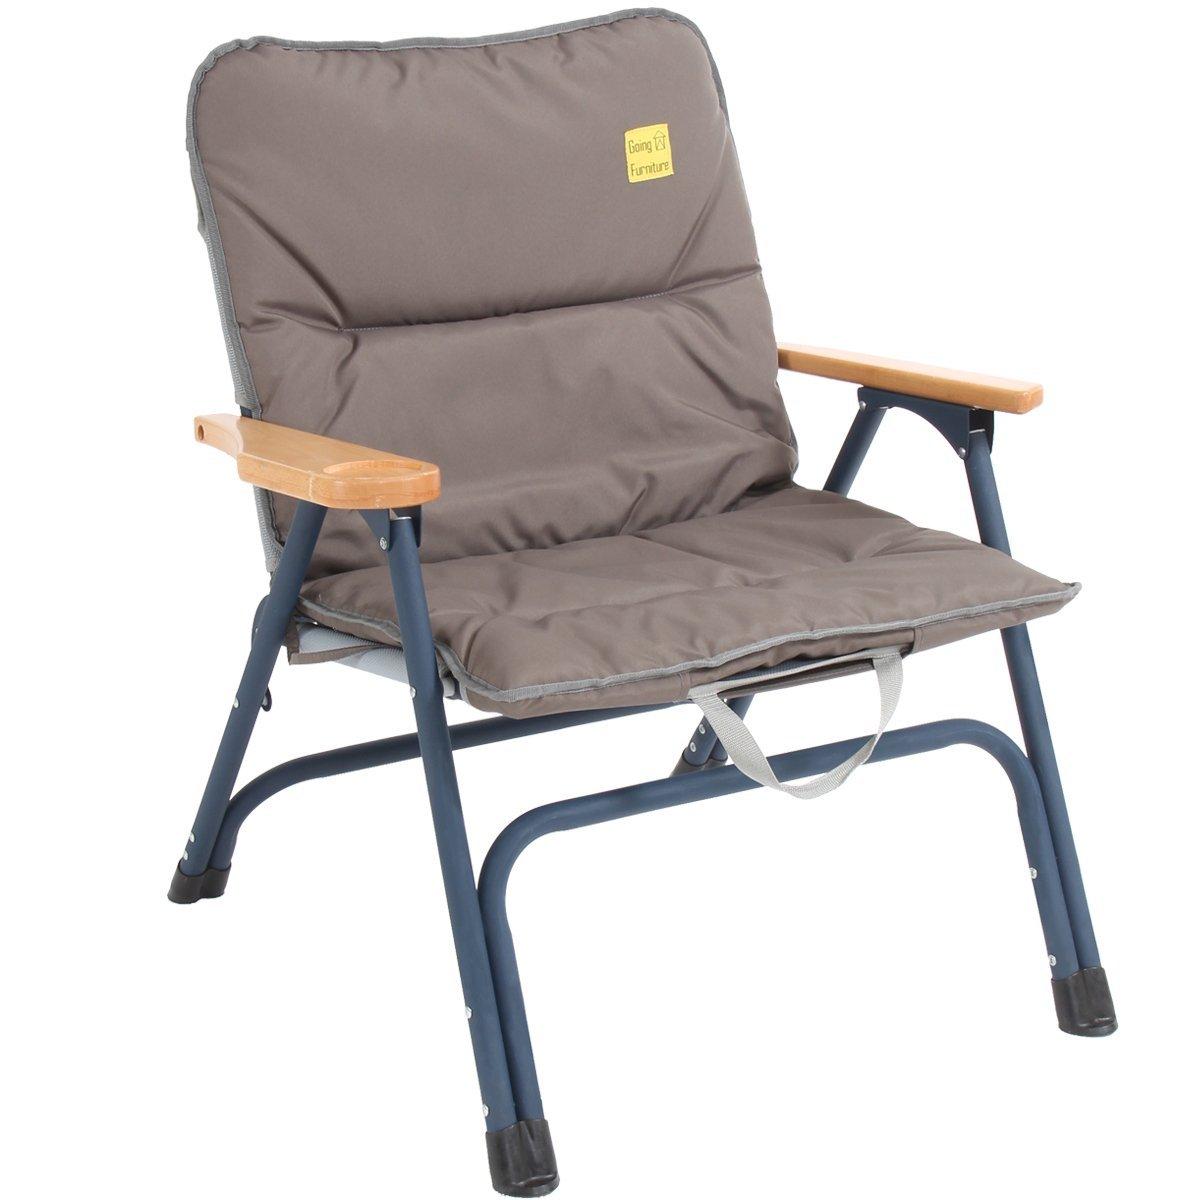 Going Furniture(ゴーイングファニチャー) ワンハンドキャリーソファ ワンシーター 家でも外でも使える 1人用ソファ CS1-441